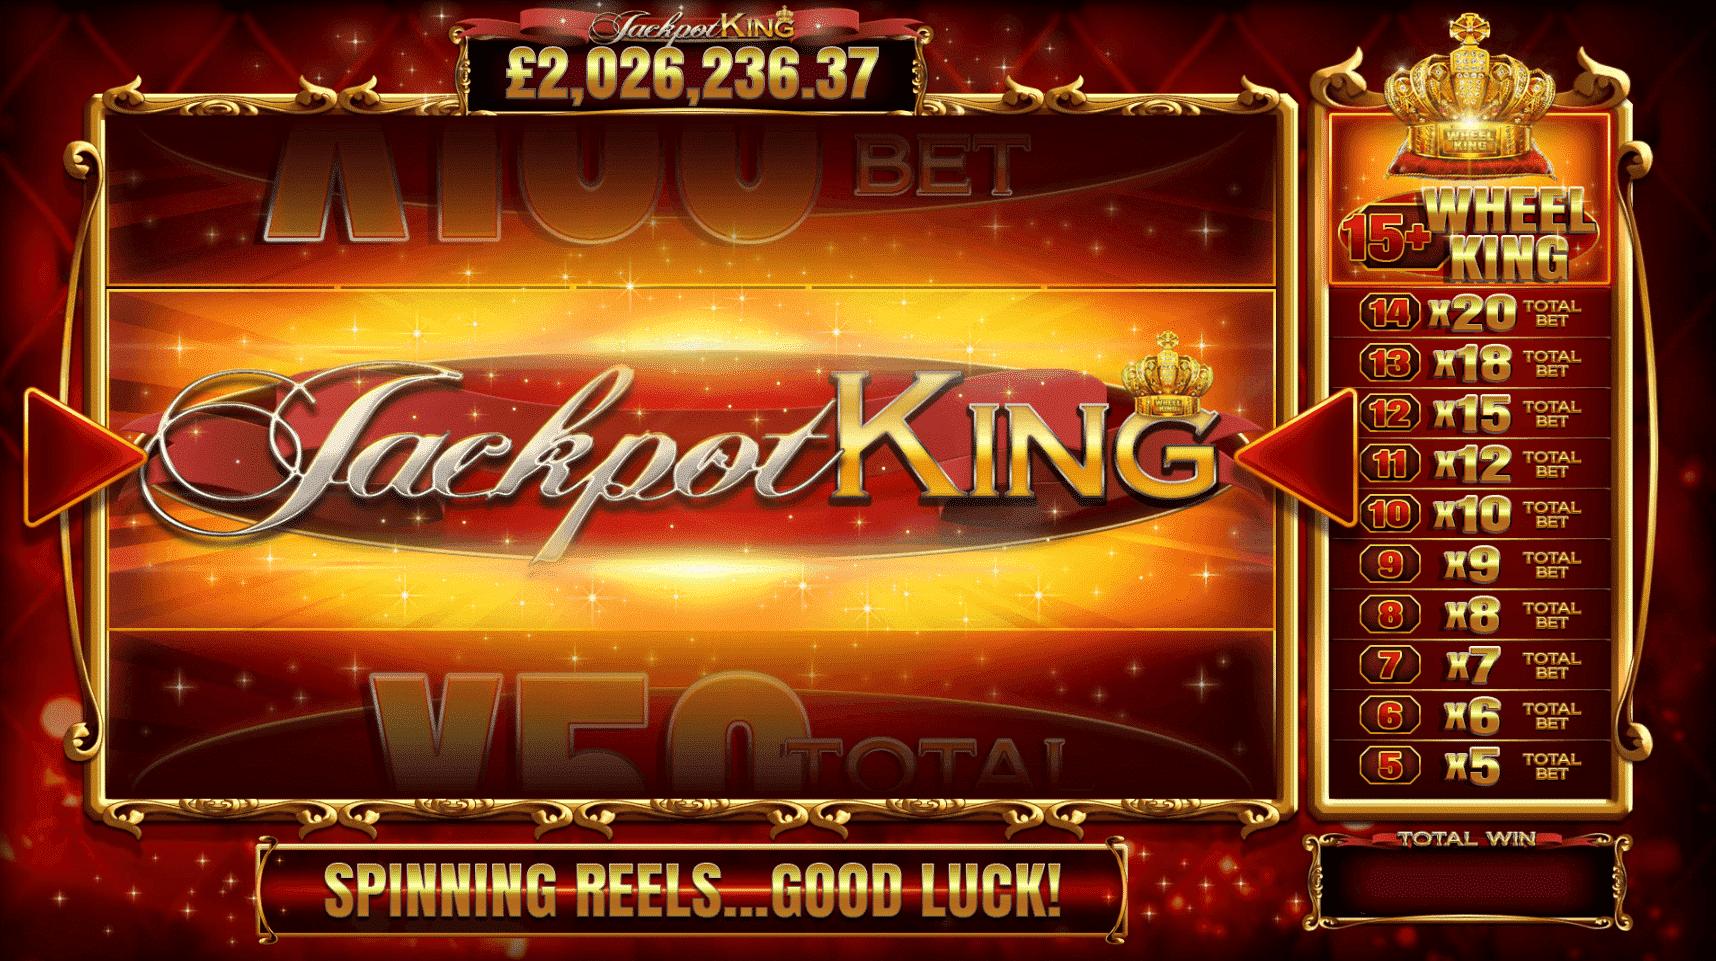 Blueprint Gaming's Jackpot King